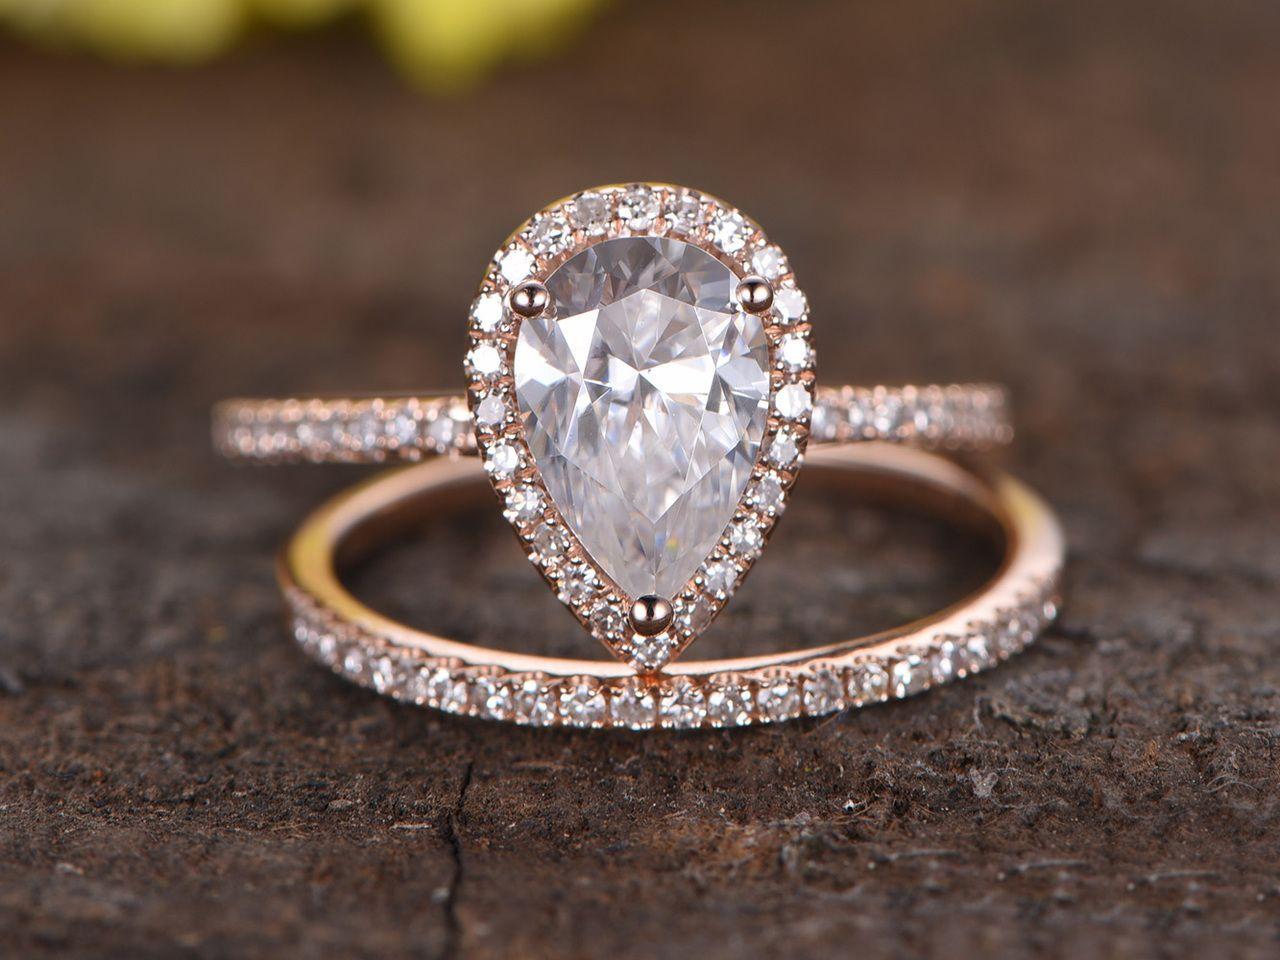 15 Carat Pear Shaped Moissanite Engagement Ring Set